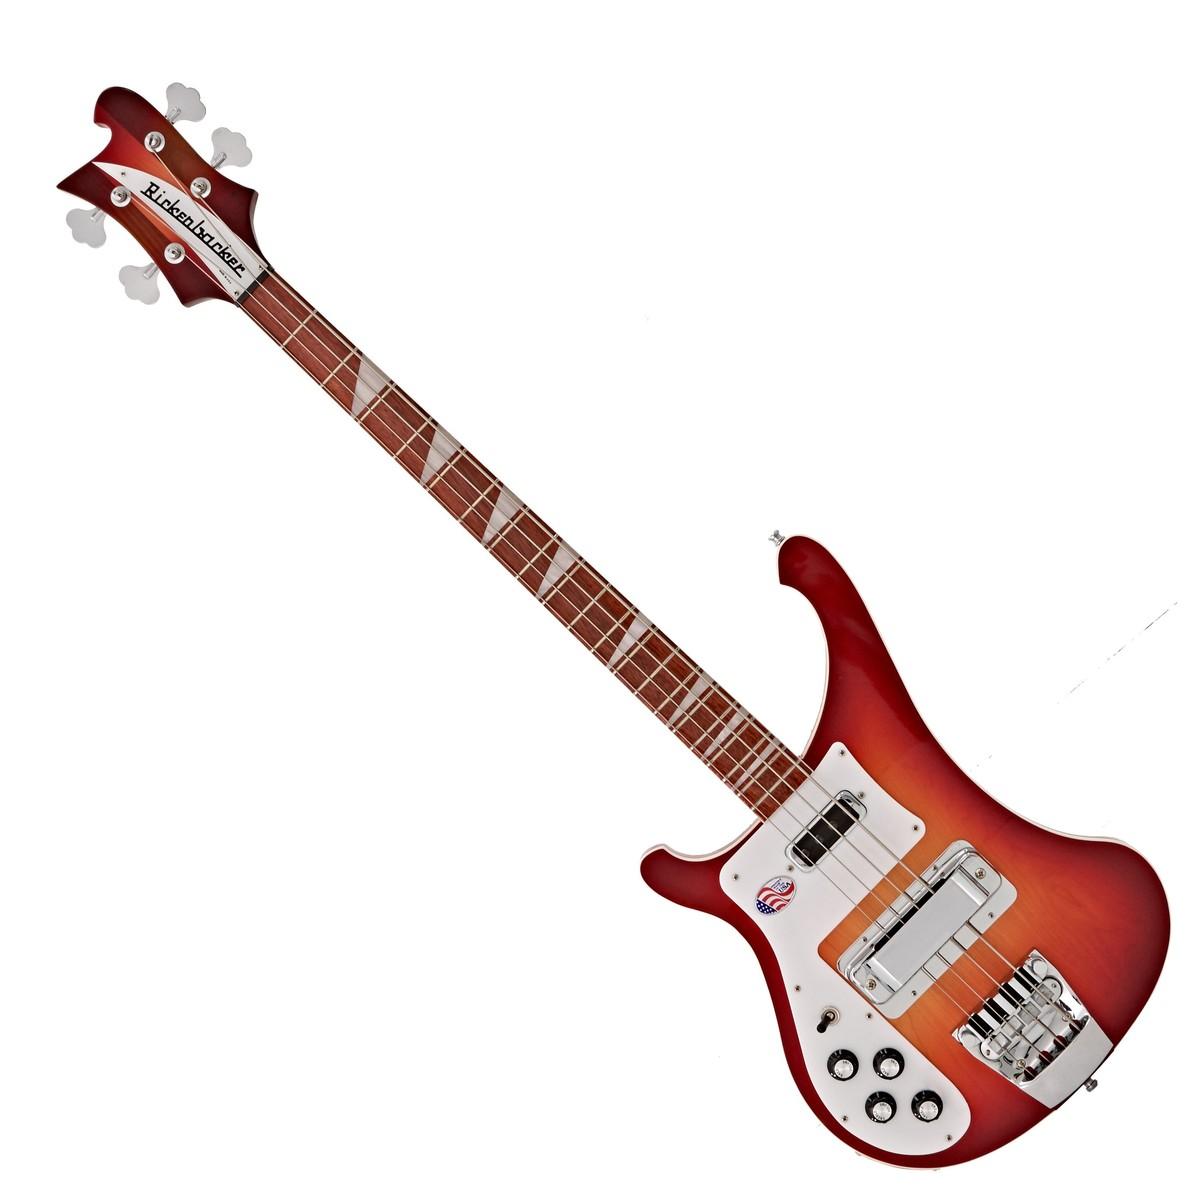 rickenbacker 4003 left handed bass guitar fireglo at gear4music. Black Bedroom Furniture Sets. Home Design Ideas